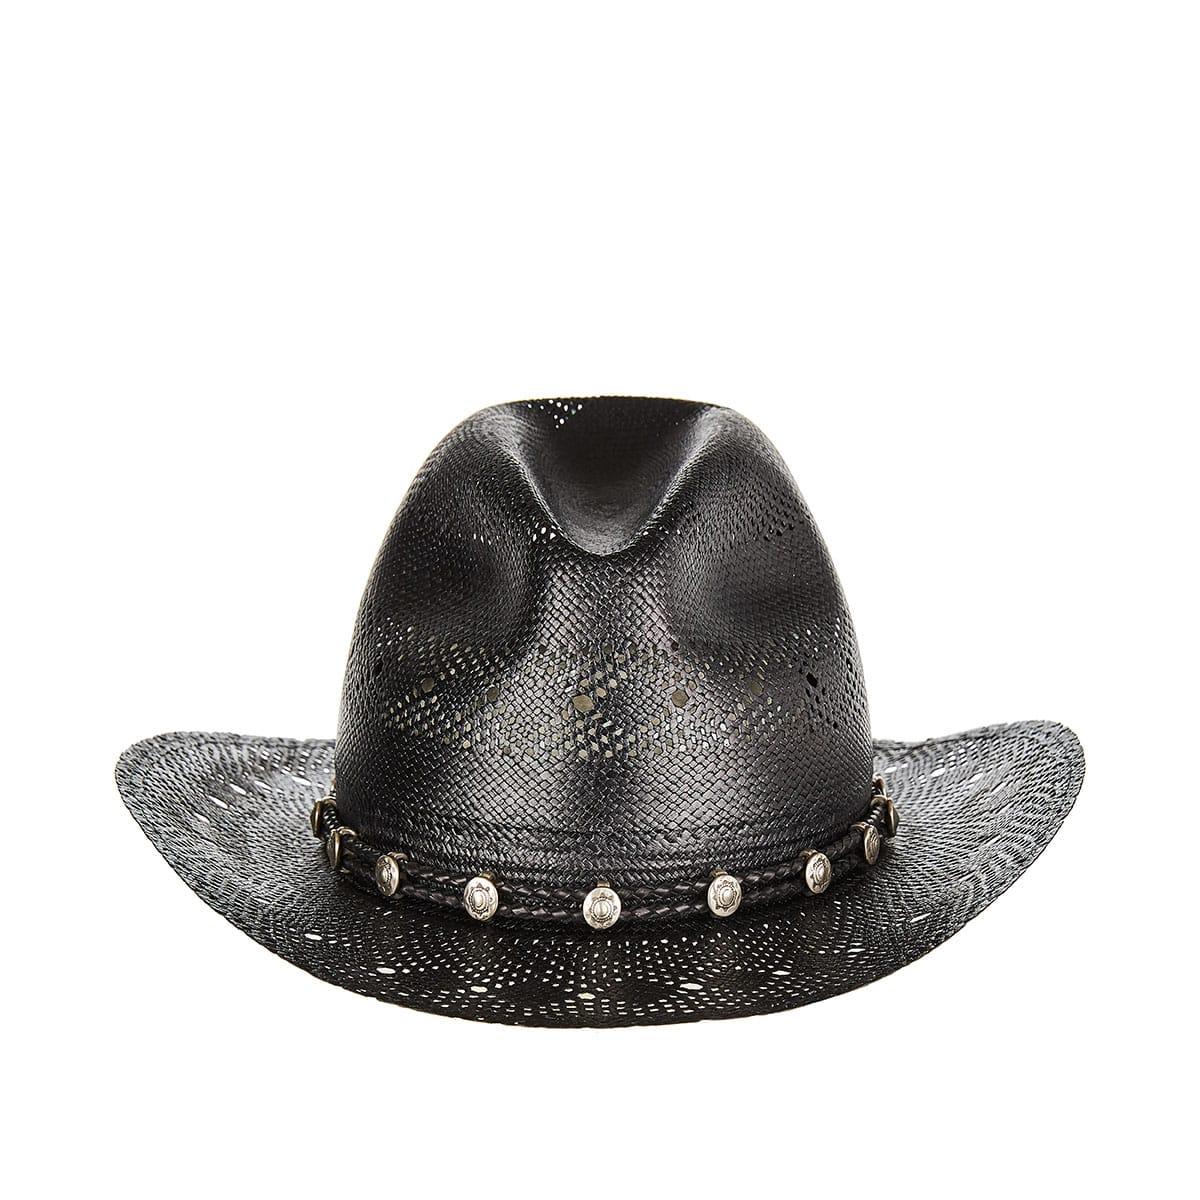 Embellished straw Western hat